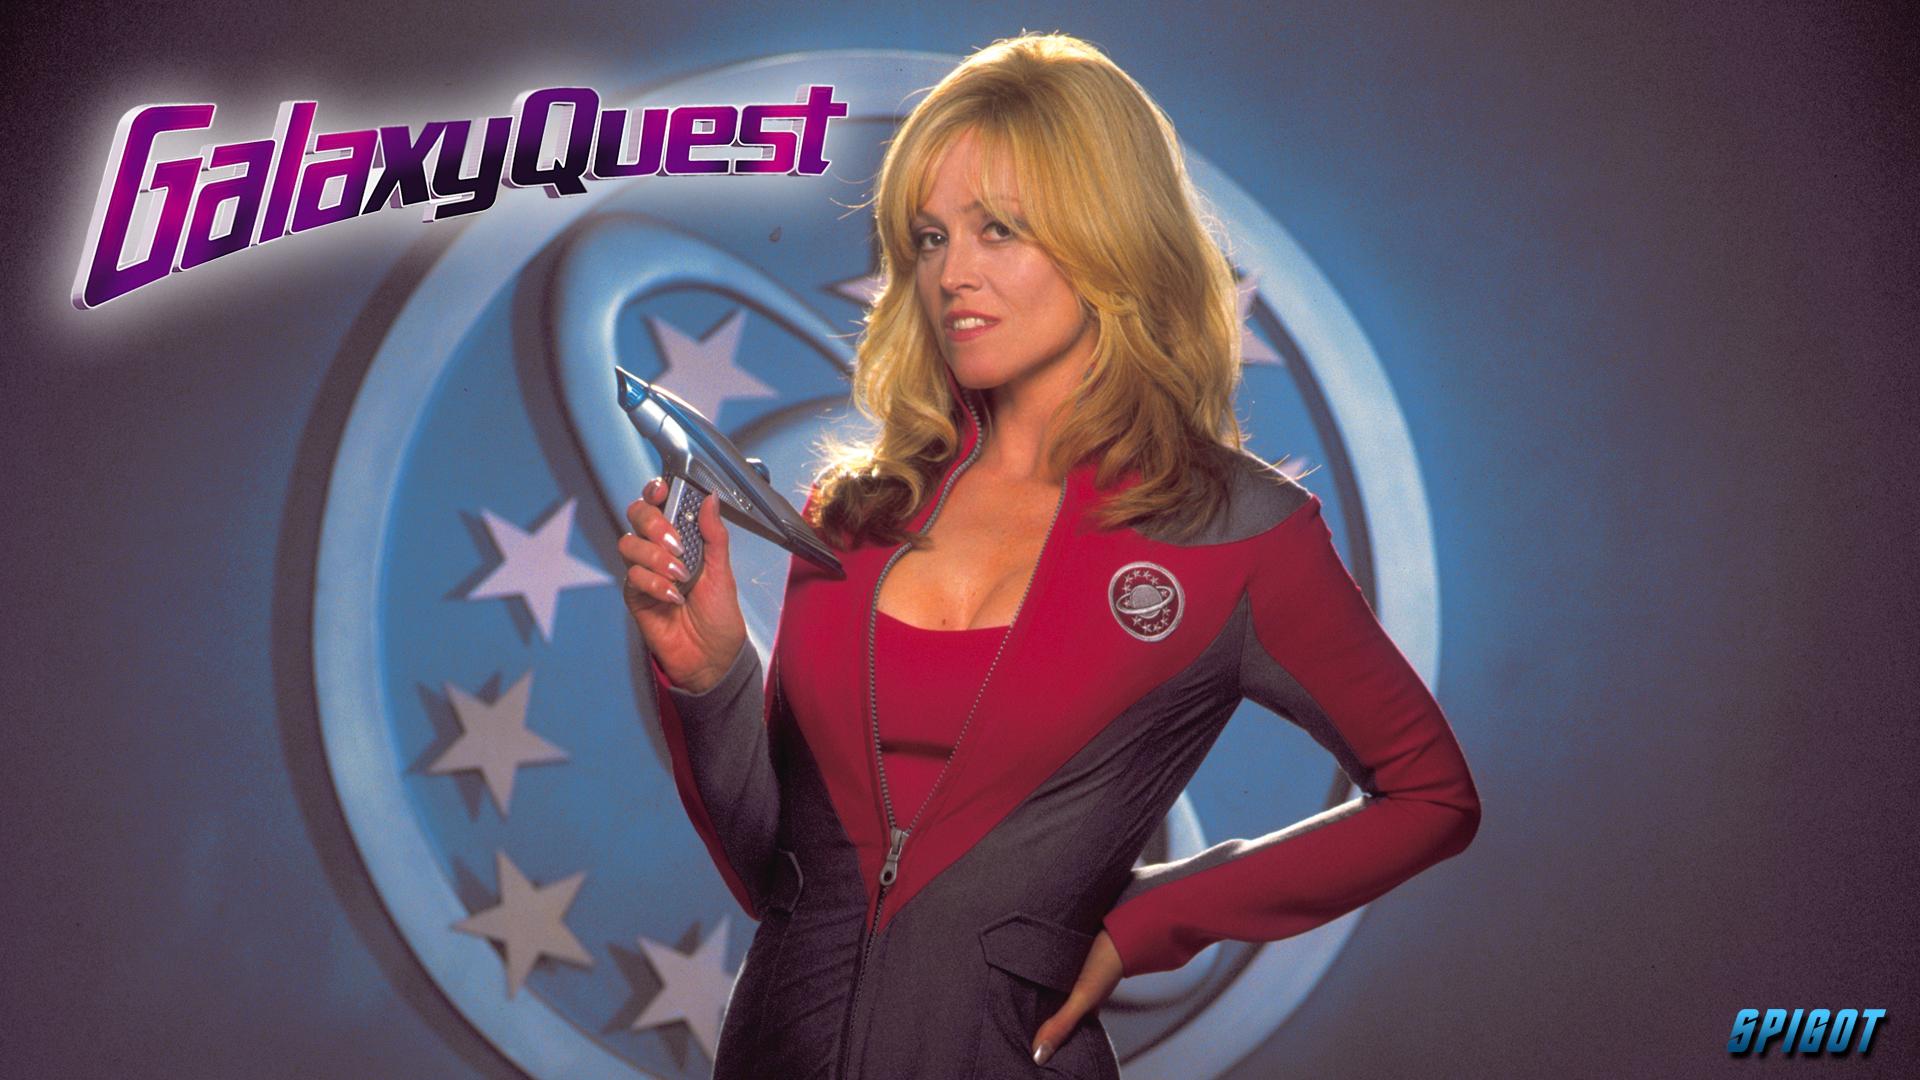 image Sigourney weaver in galaxy quest